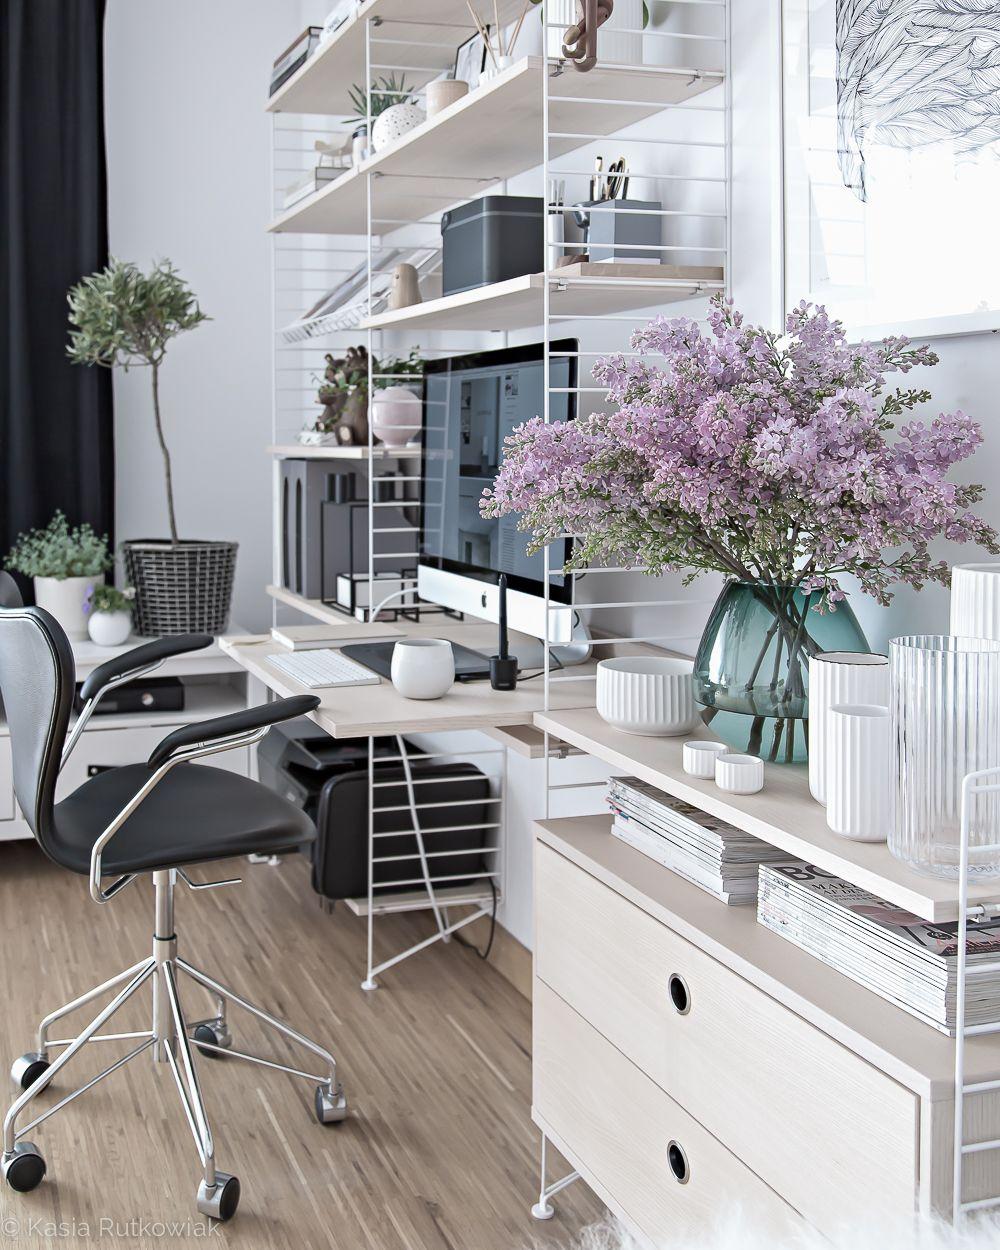 A Tour Inside a Blogger's Home Office Design home office design A Tour Inside a Blogger's Home Office Design scandinavian office design 4 1492032659